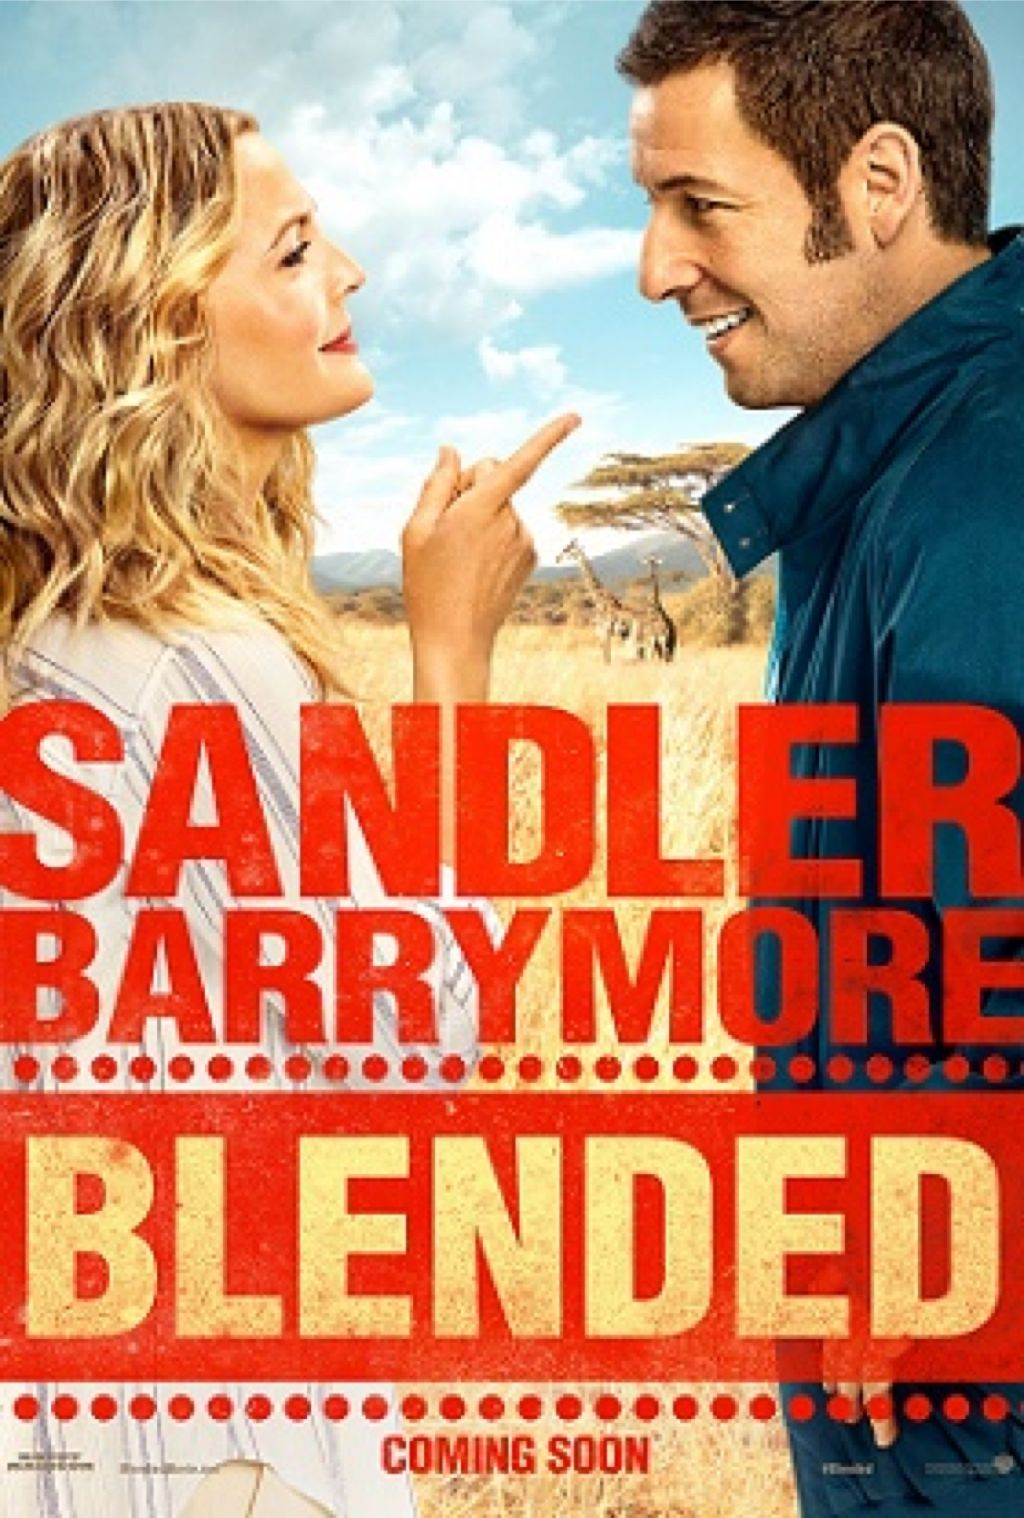 Blended - HD DVD cover